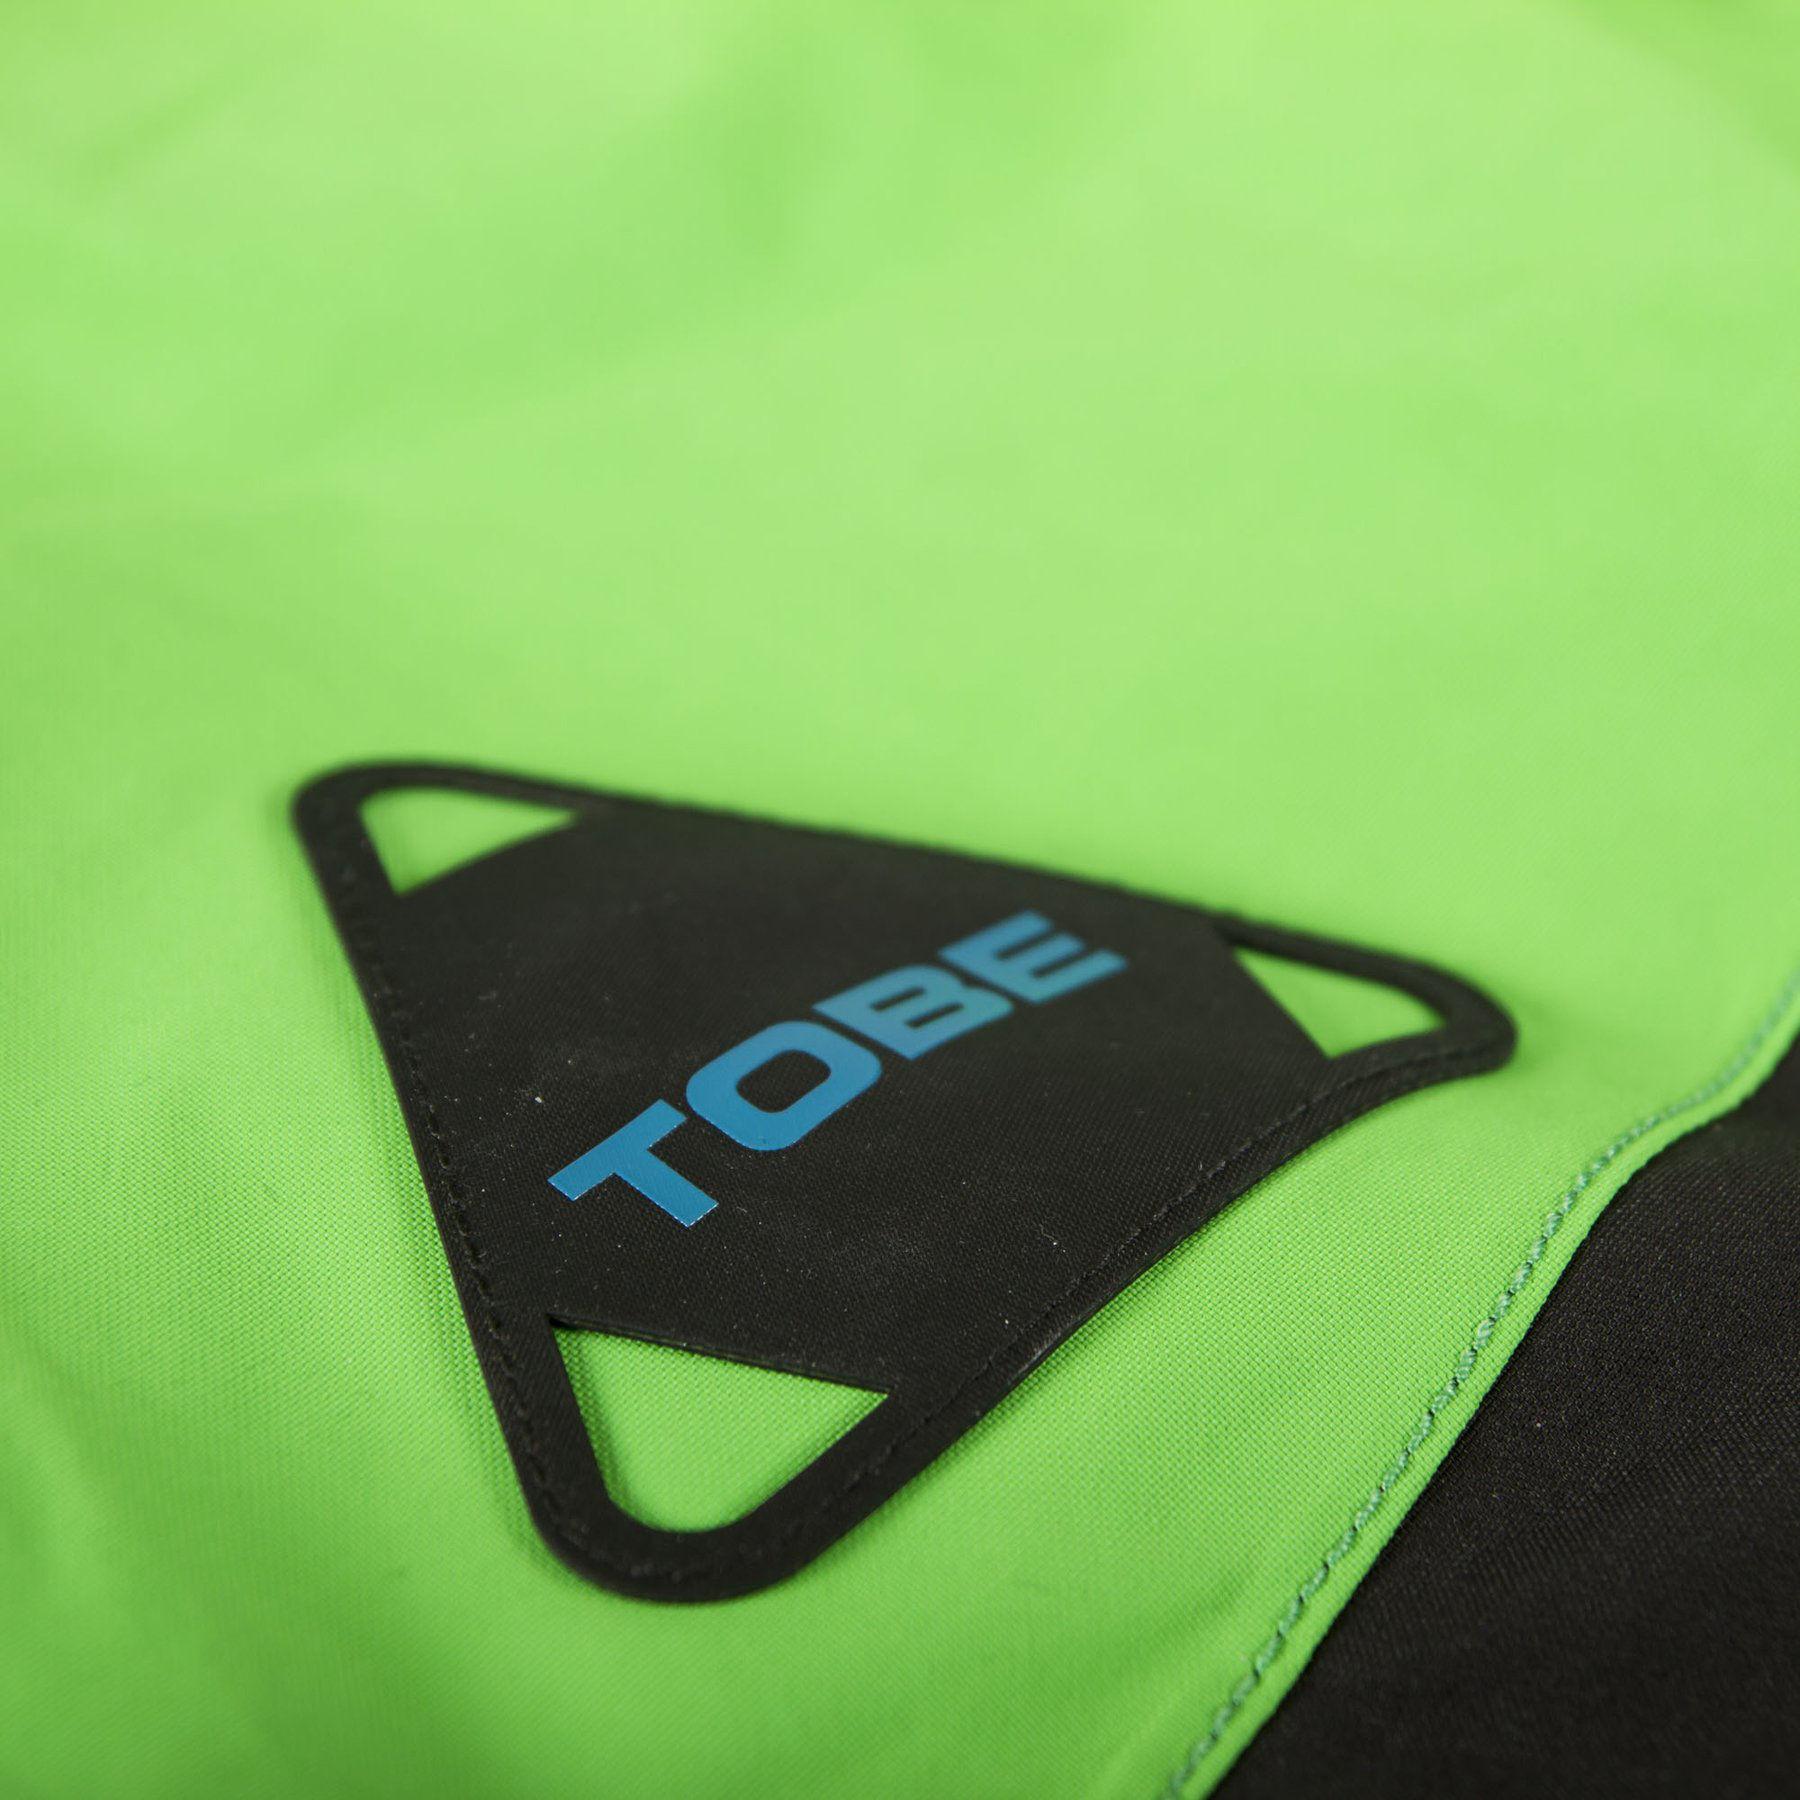 Picture of Monosuit TOBE Tiro skal, Classic Green